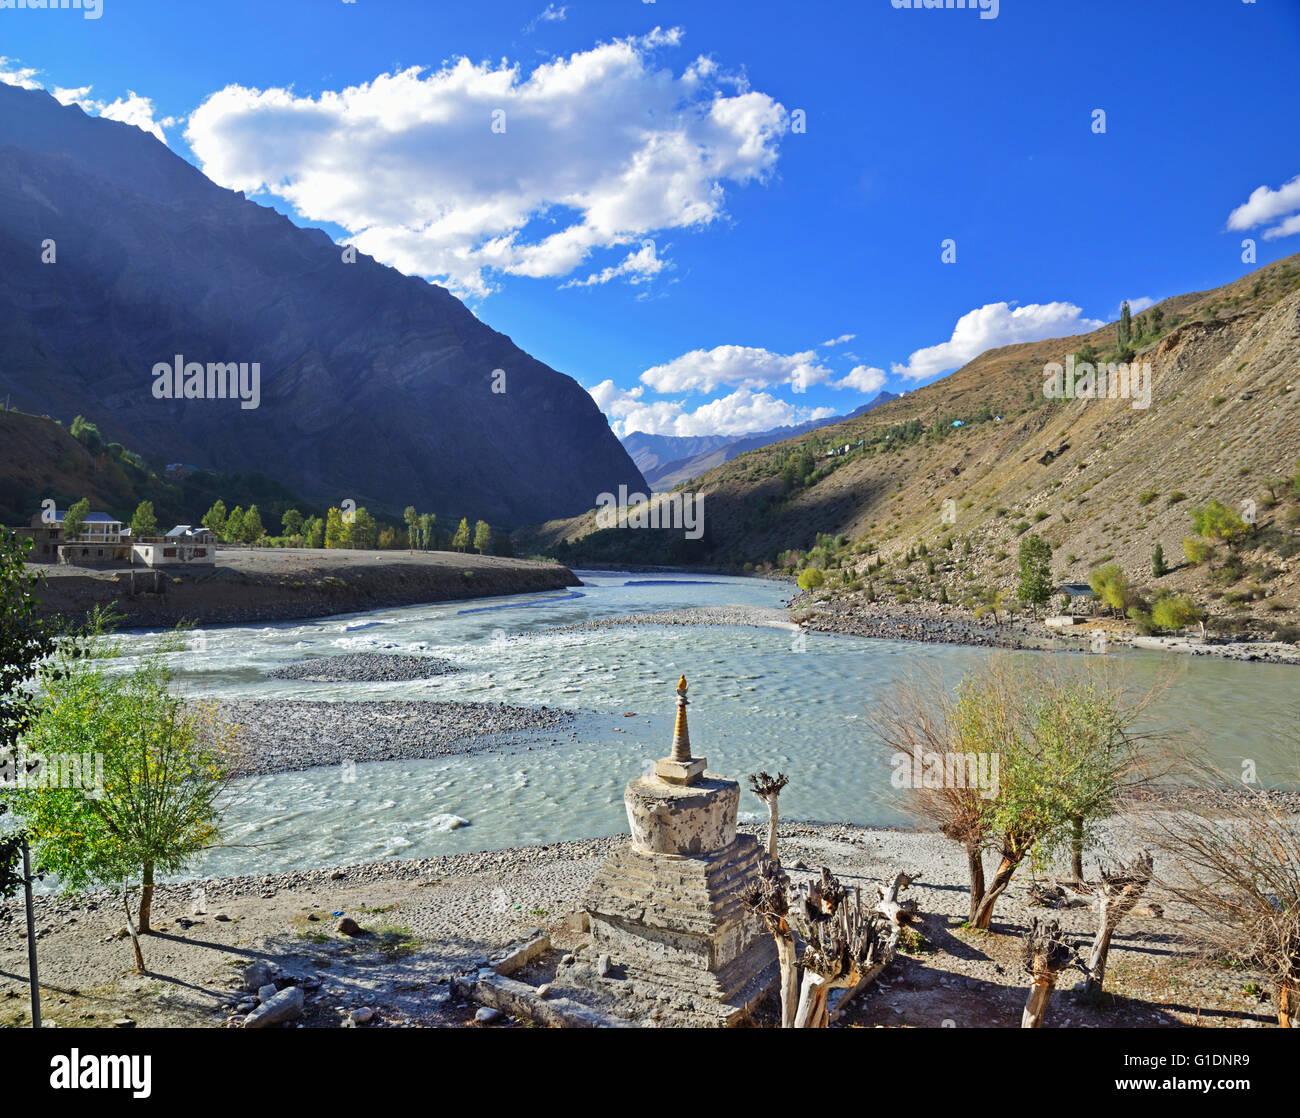 Confluence of Chandra and Bhaga rivers and creation of Chenab river, Tandi, Lahaul, Himachal Pradesh, India - Stock Image